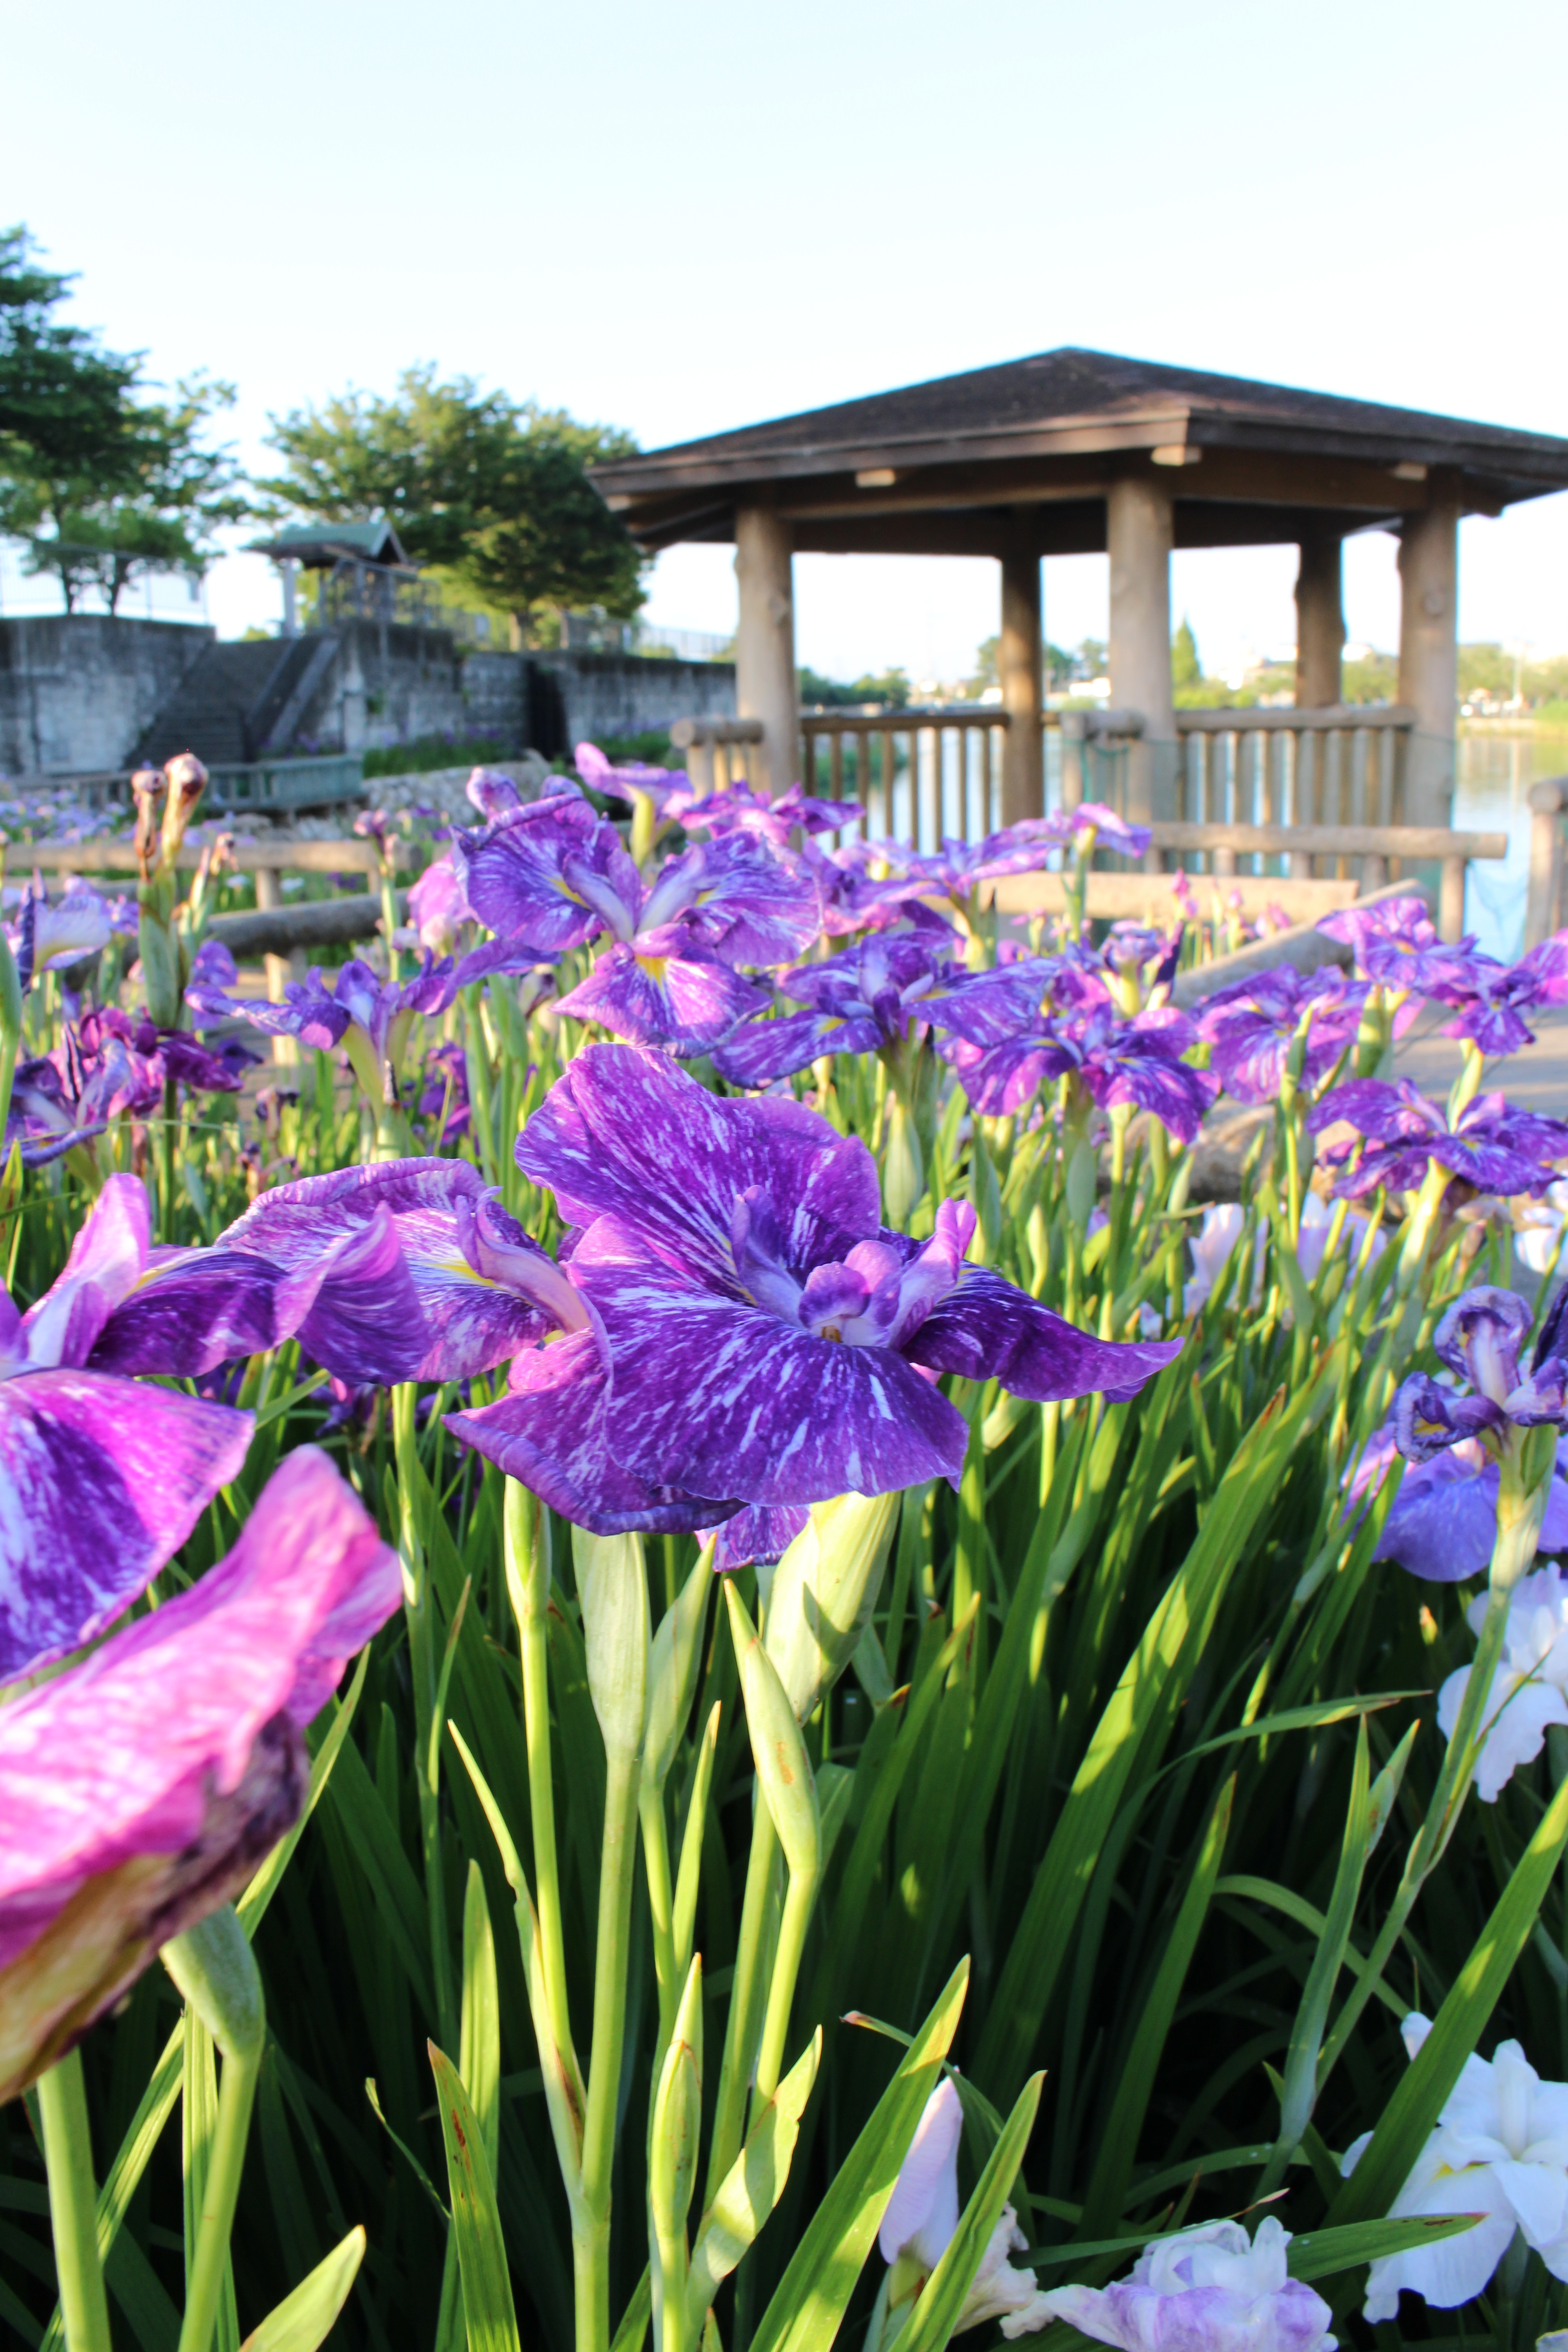 Saya River wound-go park iris